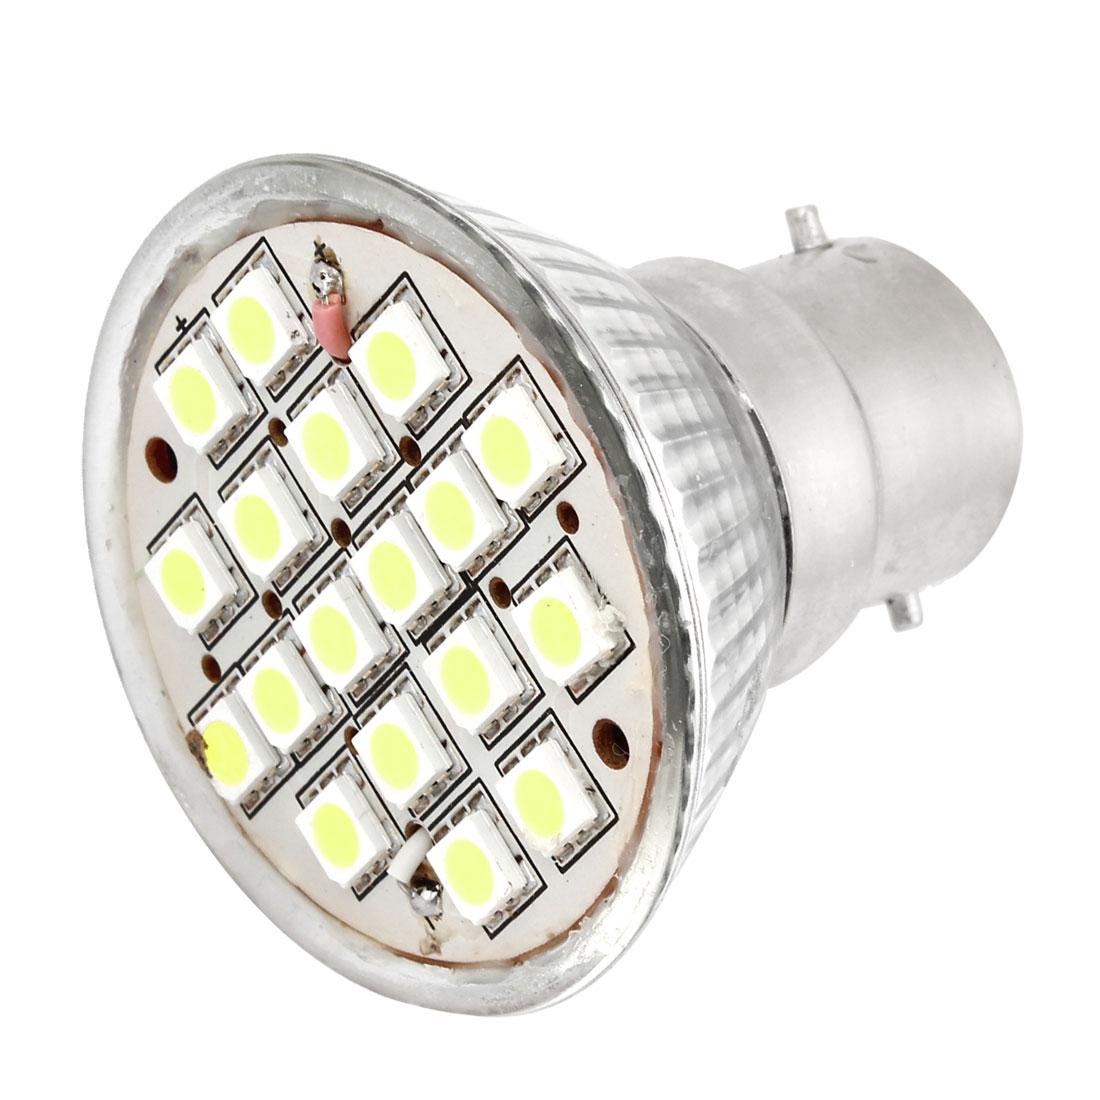 AC 110V B22 Base 18 5050 SMD 6W White LED Down Light Spotlight Bulb